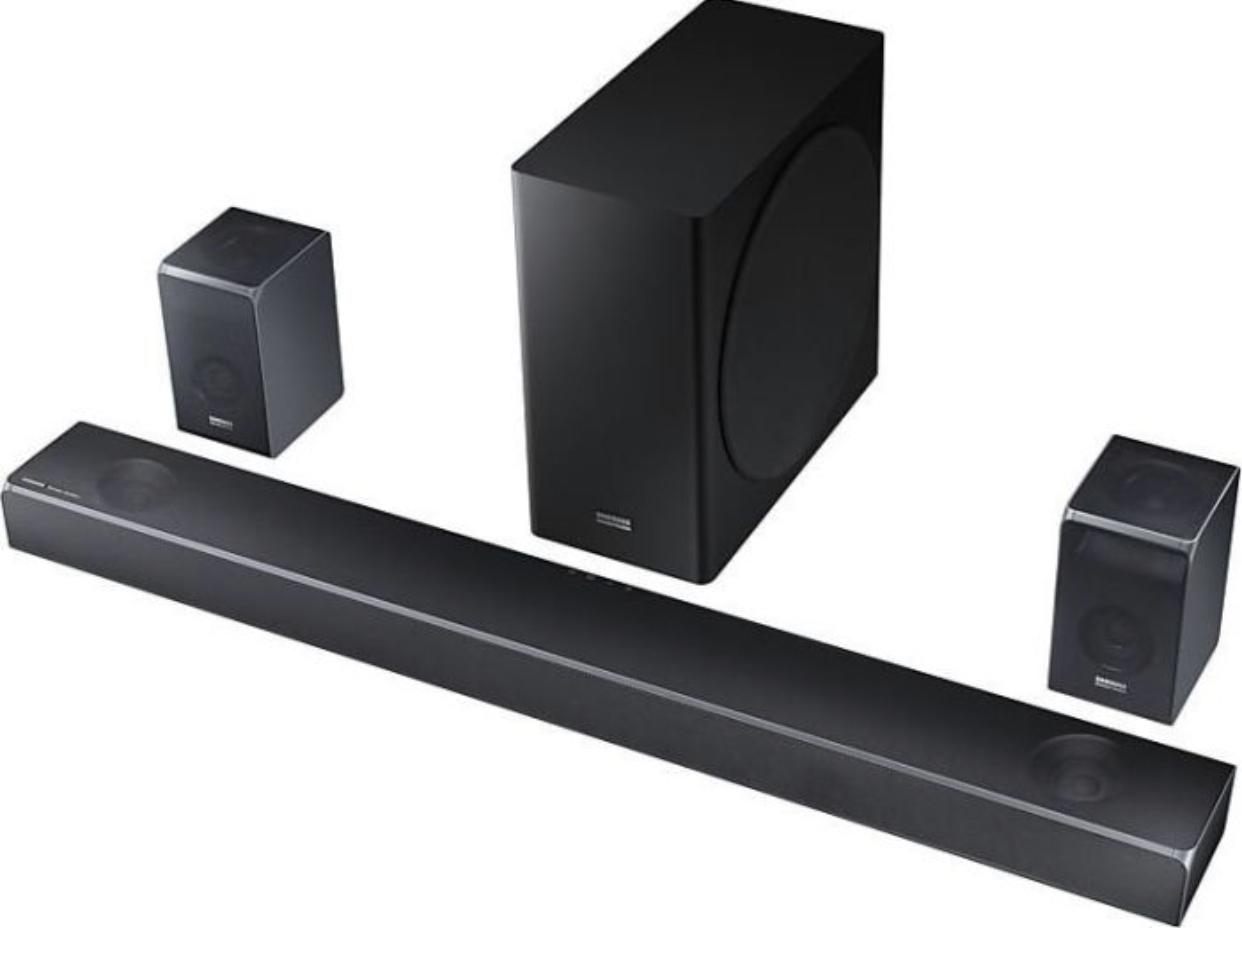 SAMSUNG SOUNDBAR HW-Q90R 7.1.4 DOLBY ATMOS, HARMAN/KARDON TECHNOLOGIE